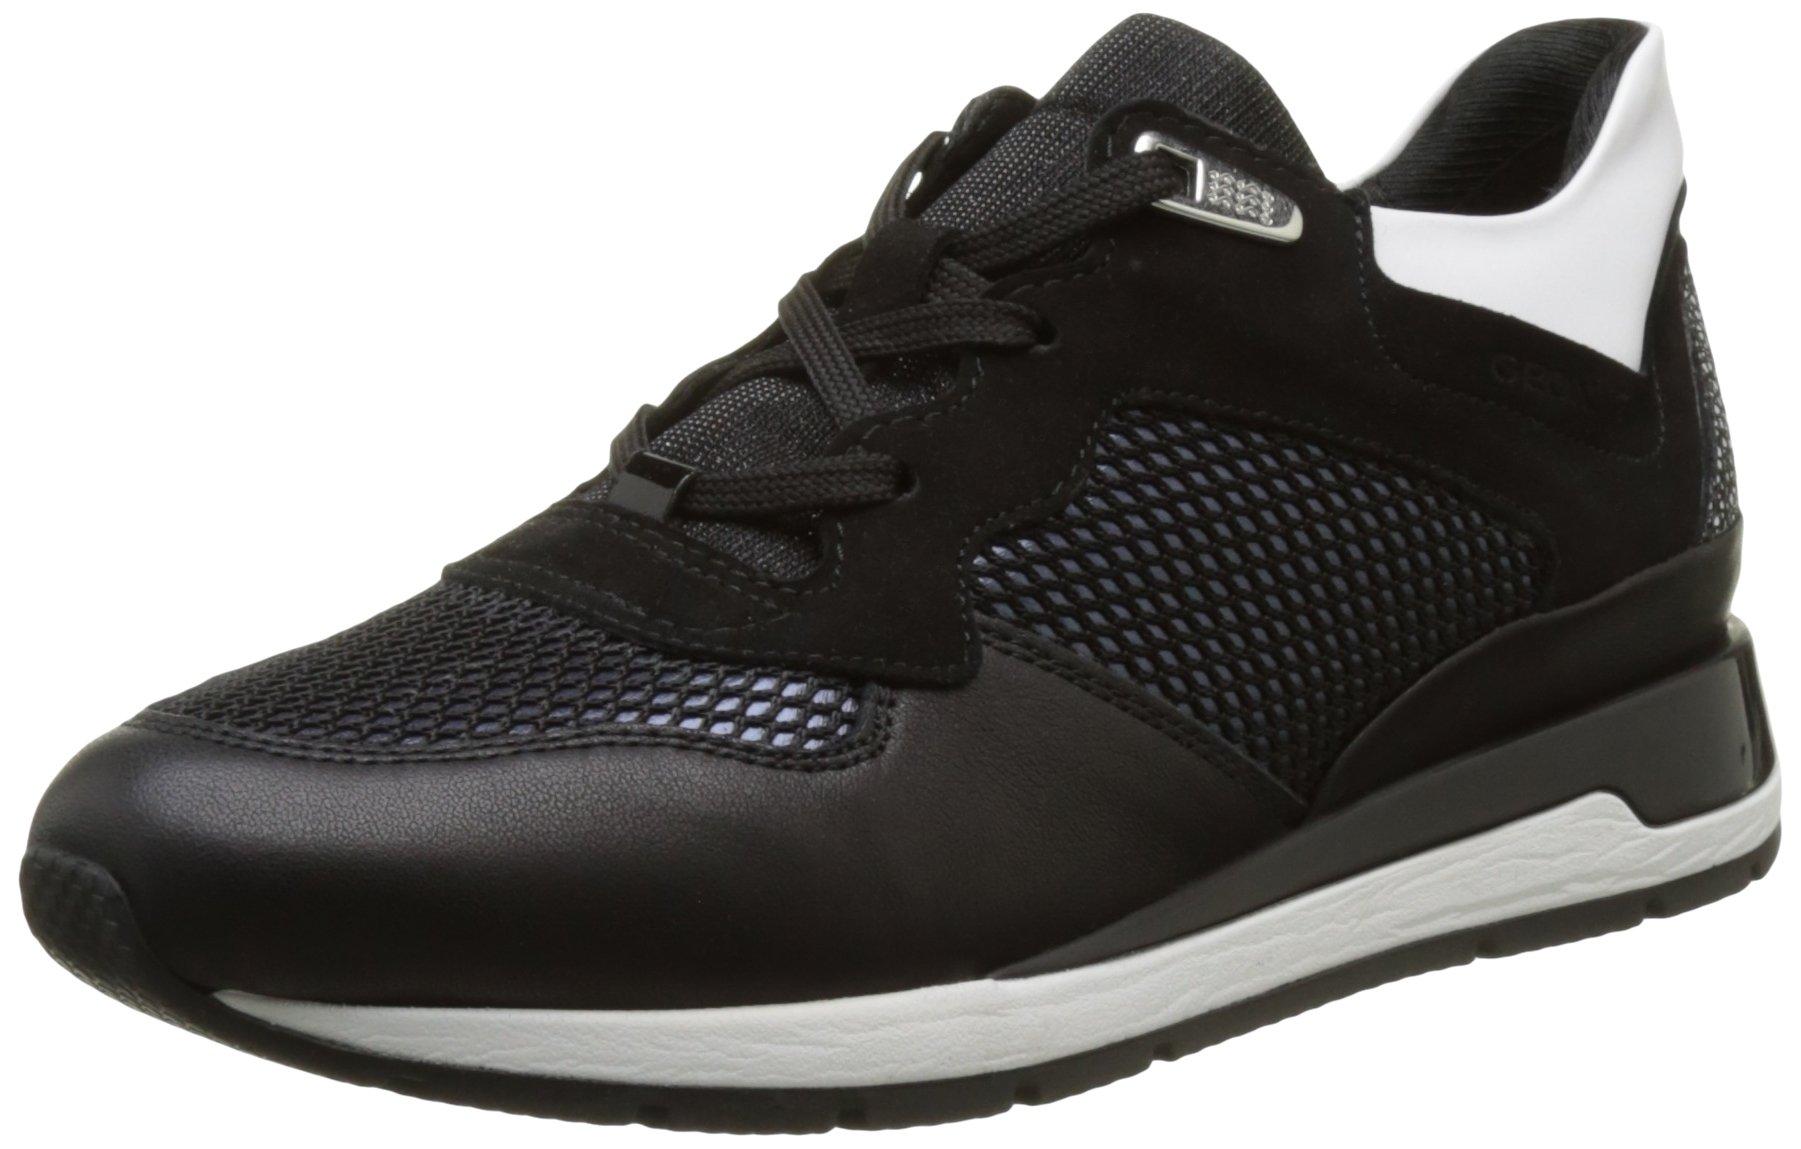 Geox D Basses BSneakers Eu Shahira FemmeNoirblackc999936 eWECBxQord